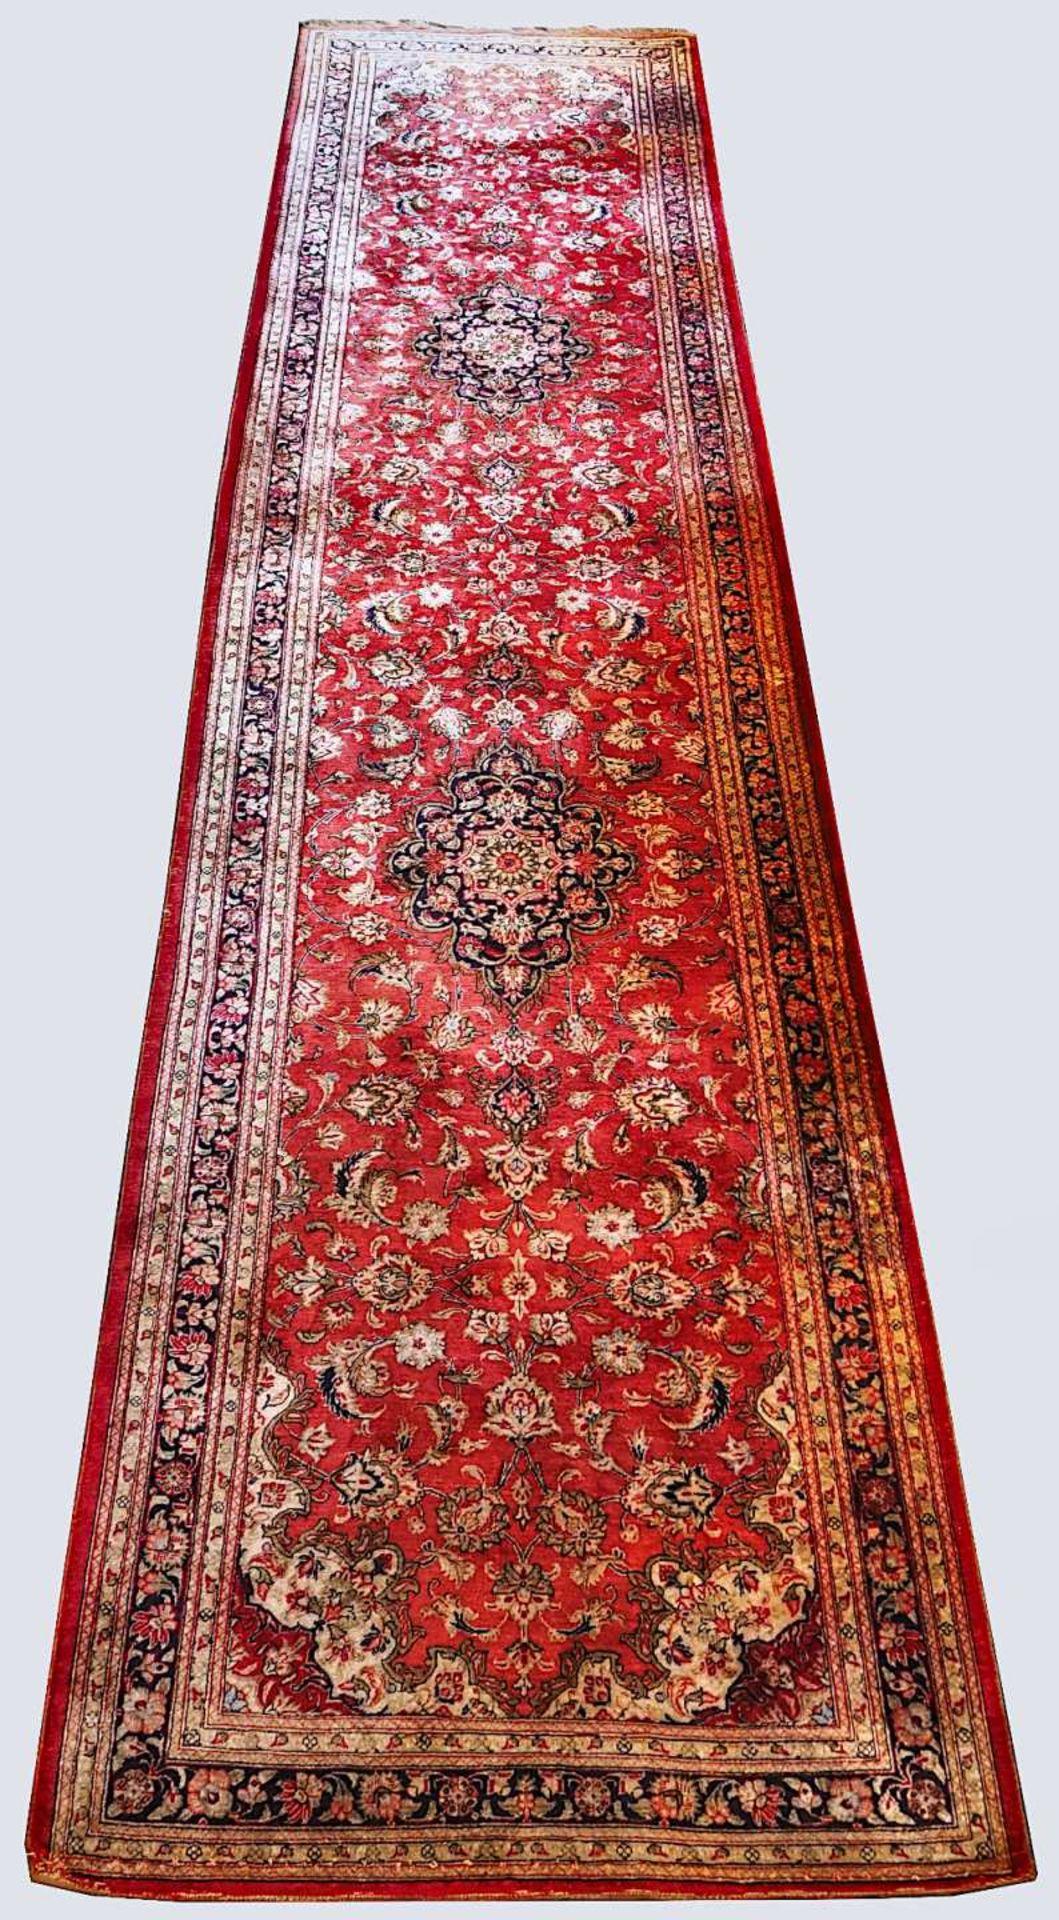 2 Orientgalerien 20. Jh., z.T. mit Seidenanteil je rotgrundig mit floralem Dekor, je F